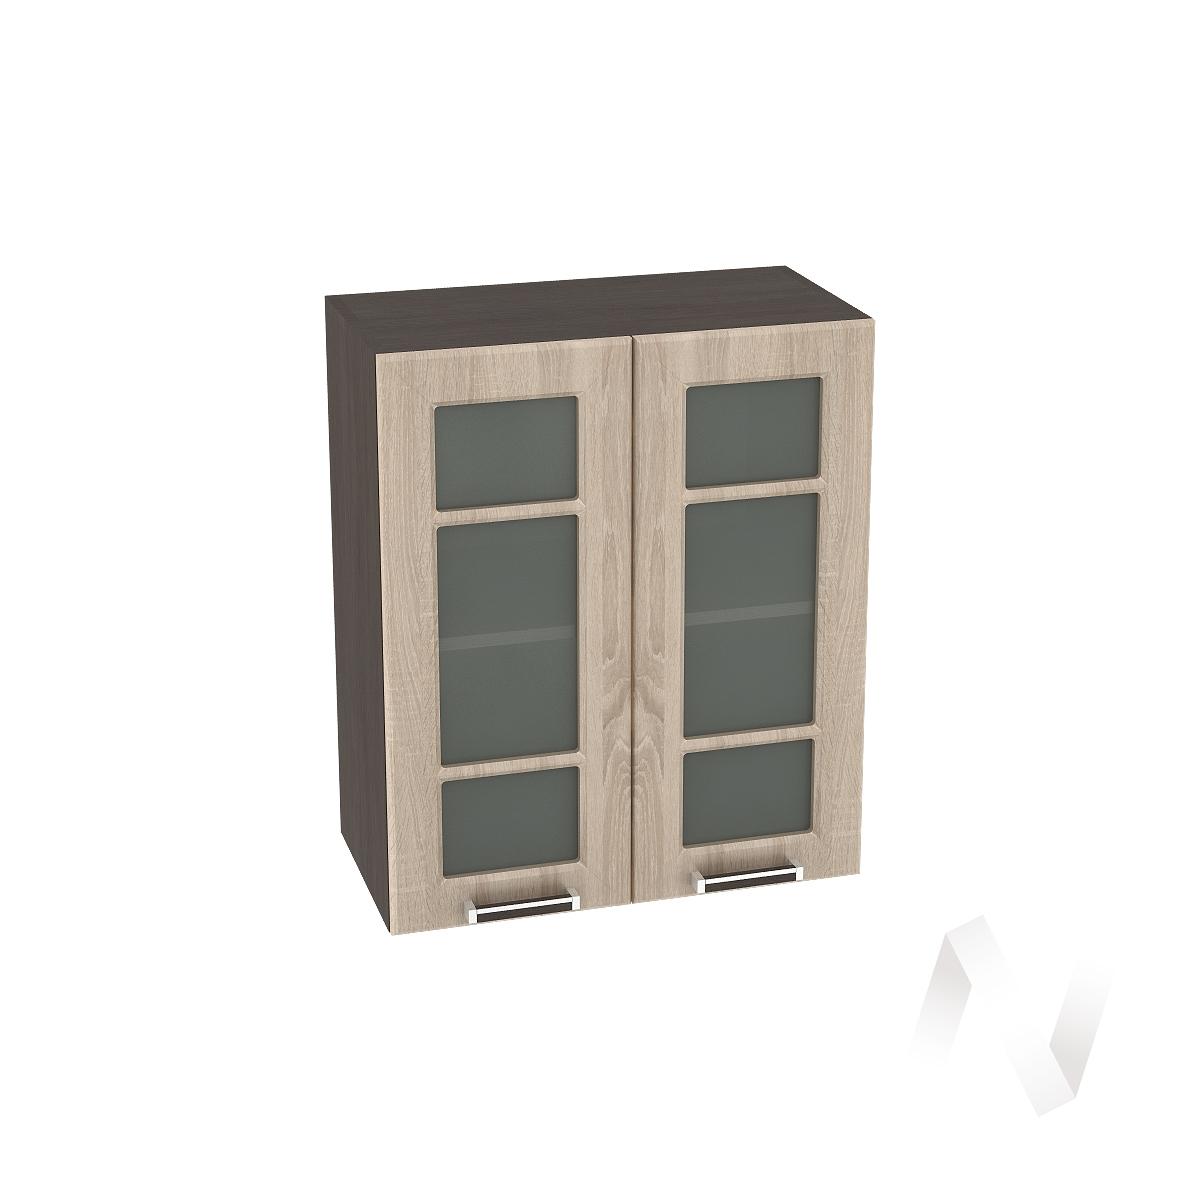 "Кухня ""Прага"": Шкаф верхний со стеклом 600, ШВС 600 (дуб сонома/корпус венге)"